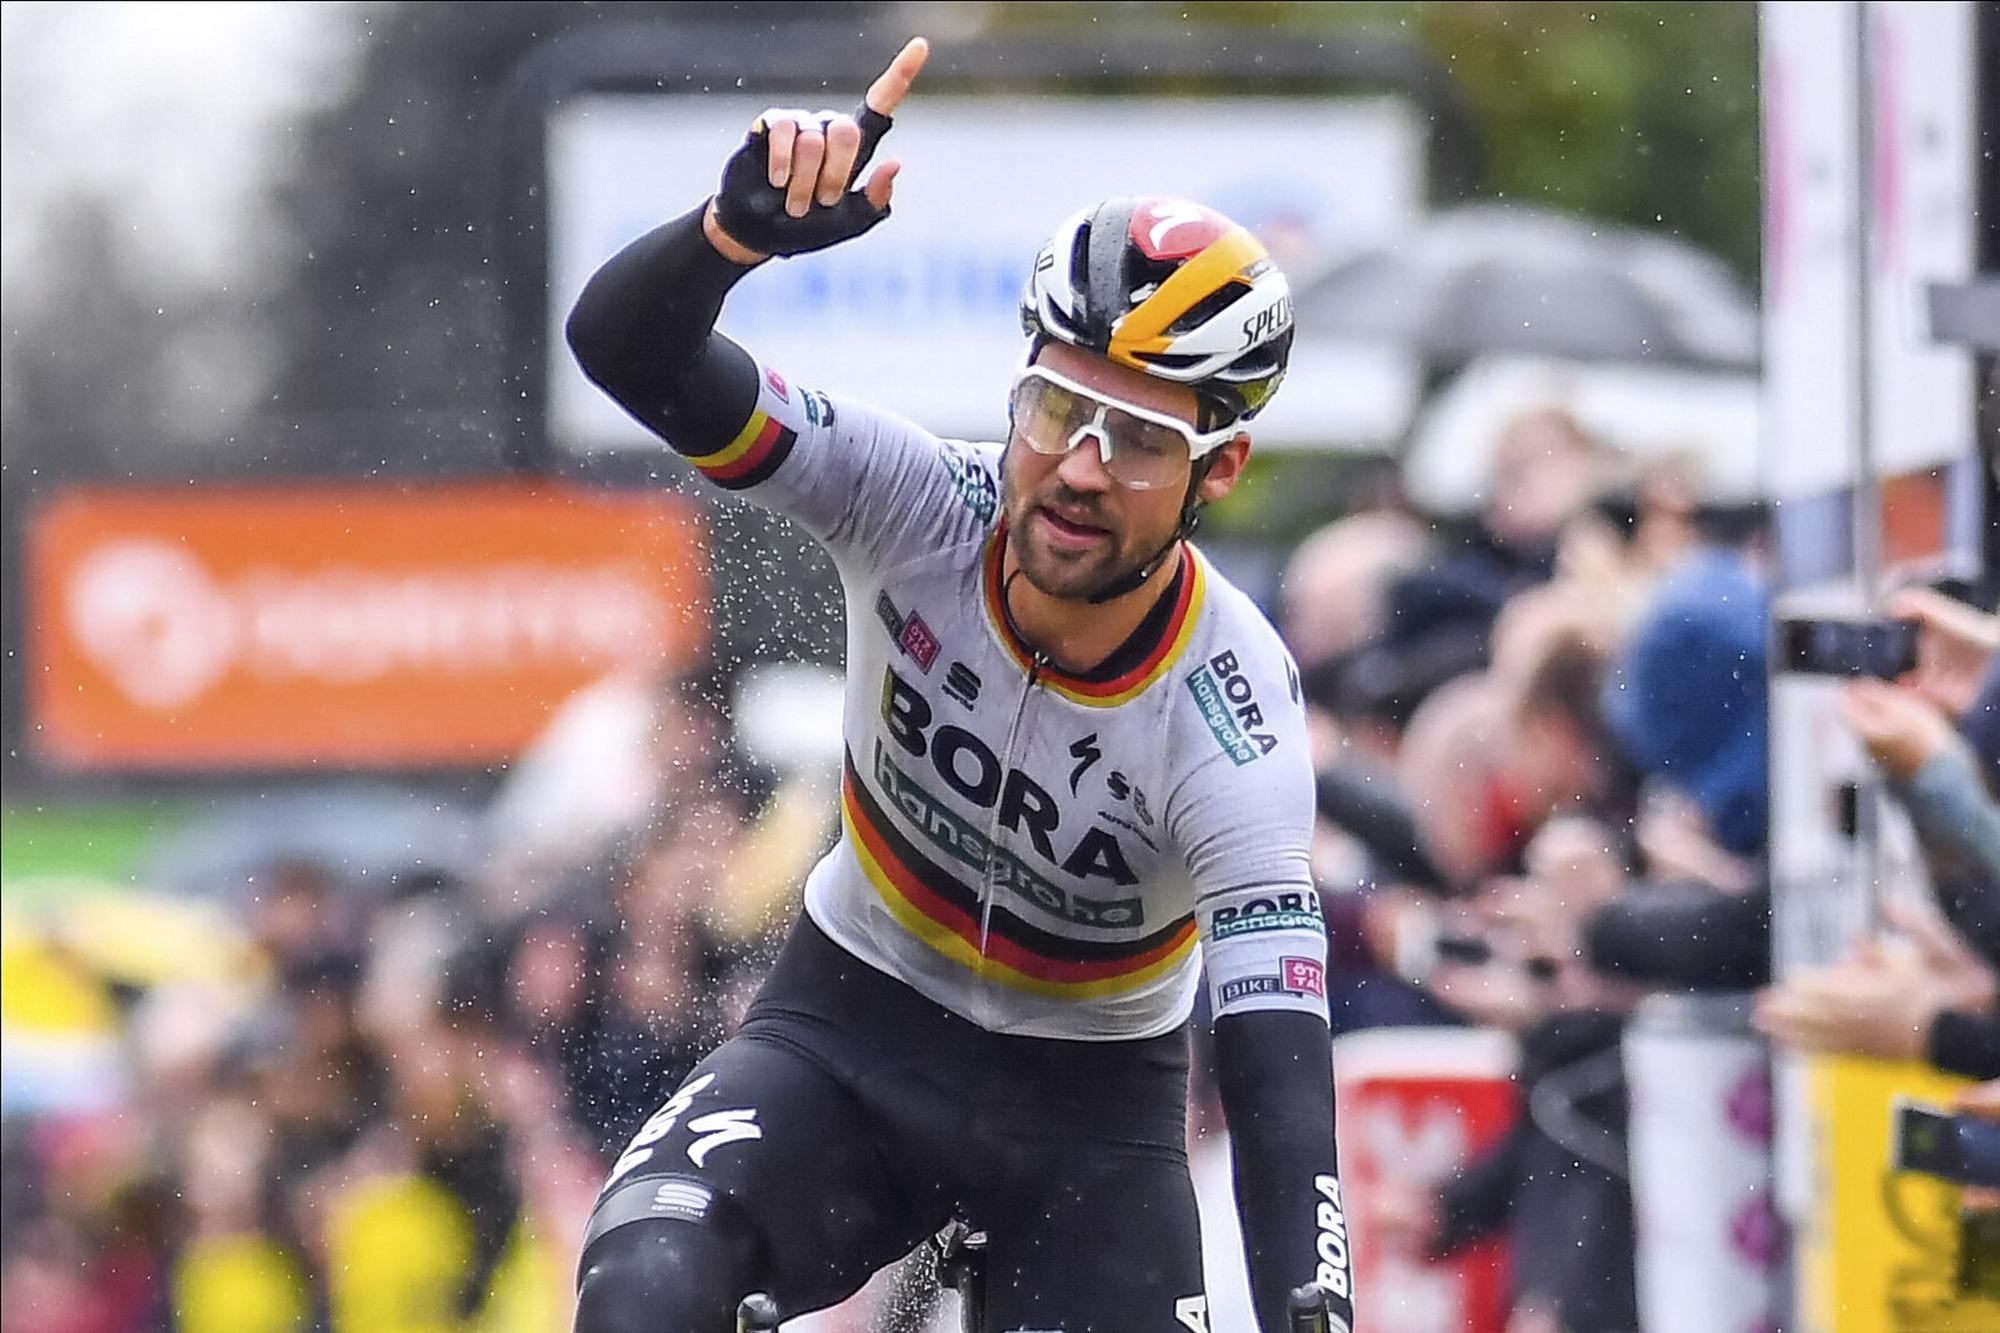 Max Schachmann wins stage 1 at Paris-Nice